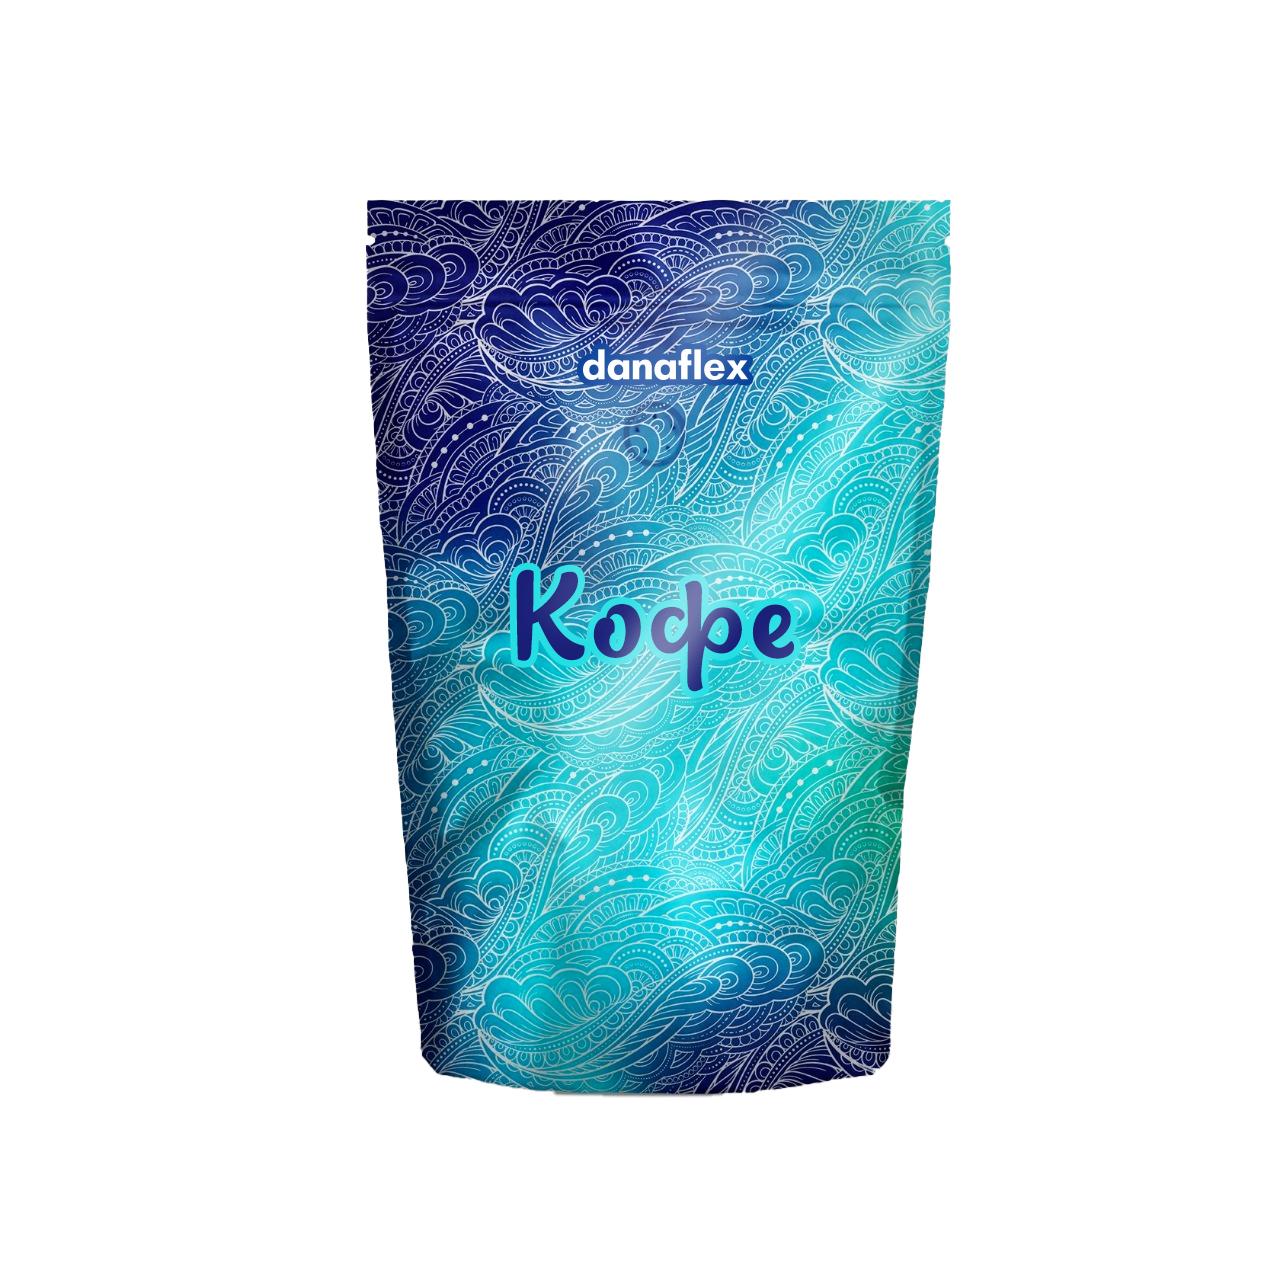 Концепт дизайна упаковки пакета кофе